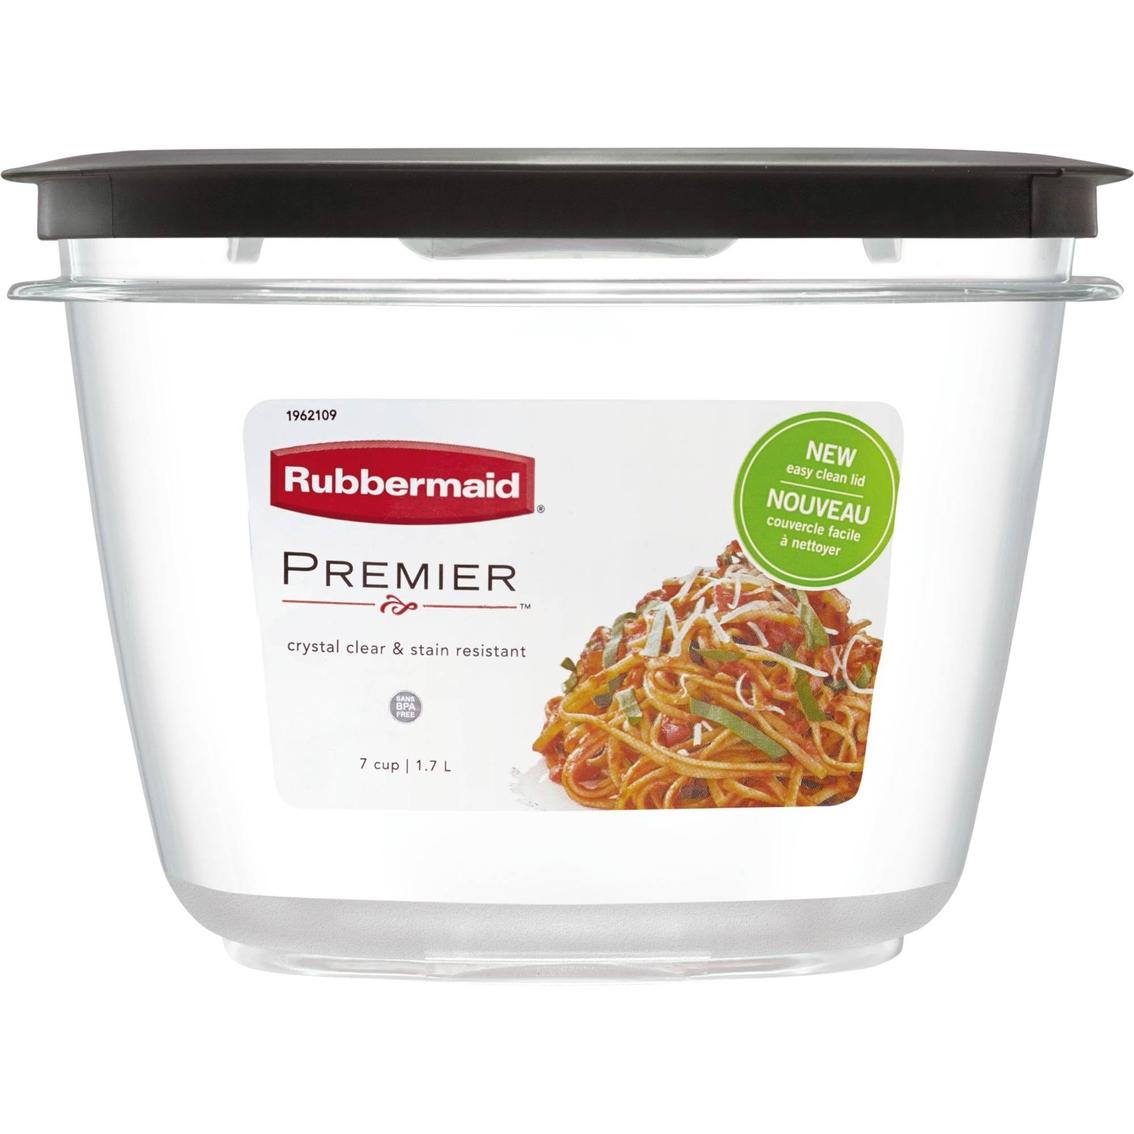 Rubbermaid Premier 7 Cup Food Storage Container Food Storage